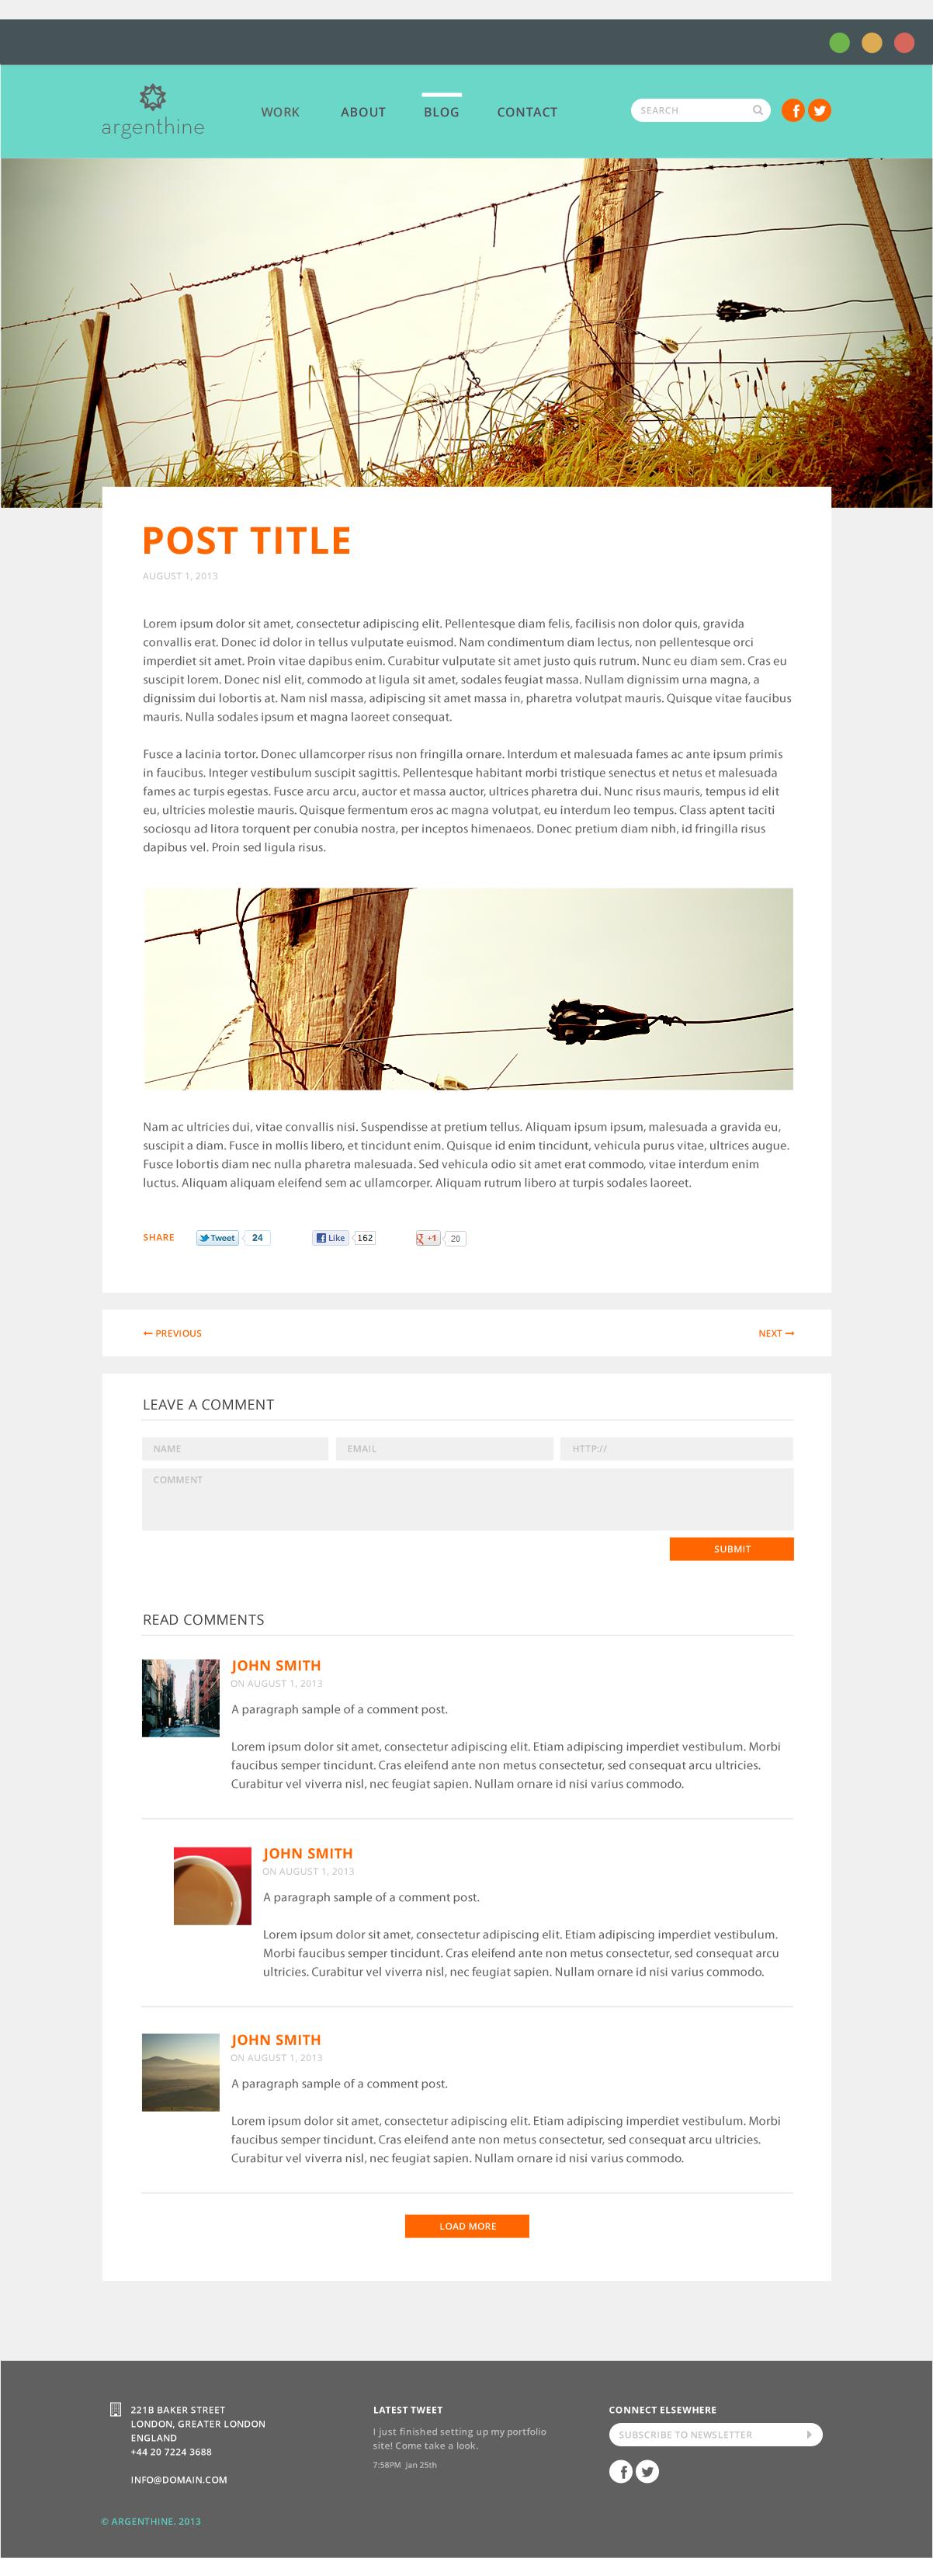 Argenthine_2BlogDetails